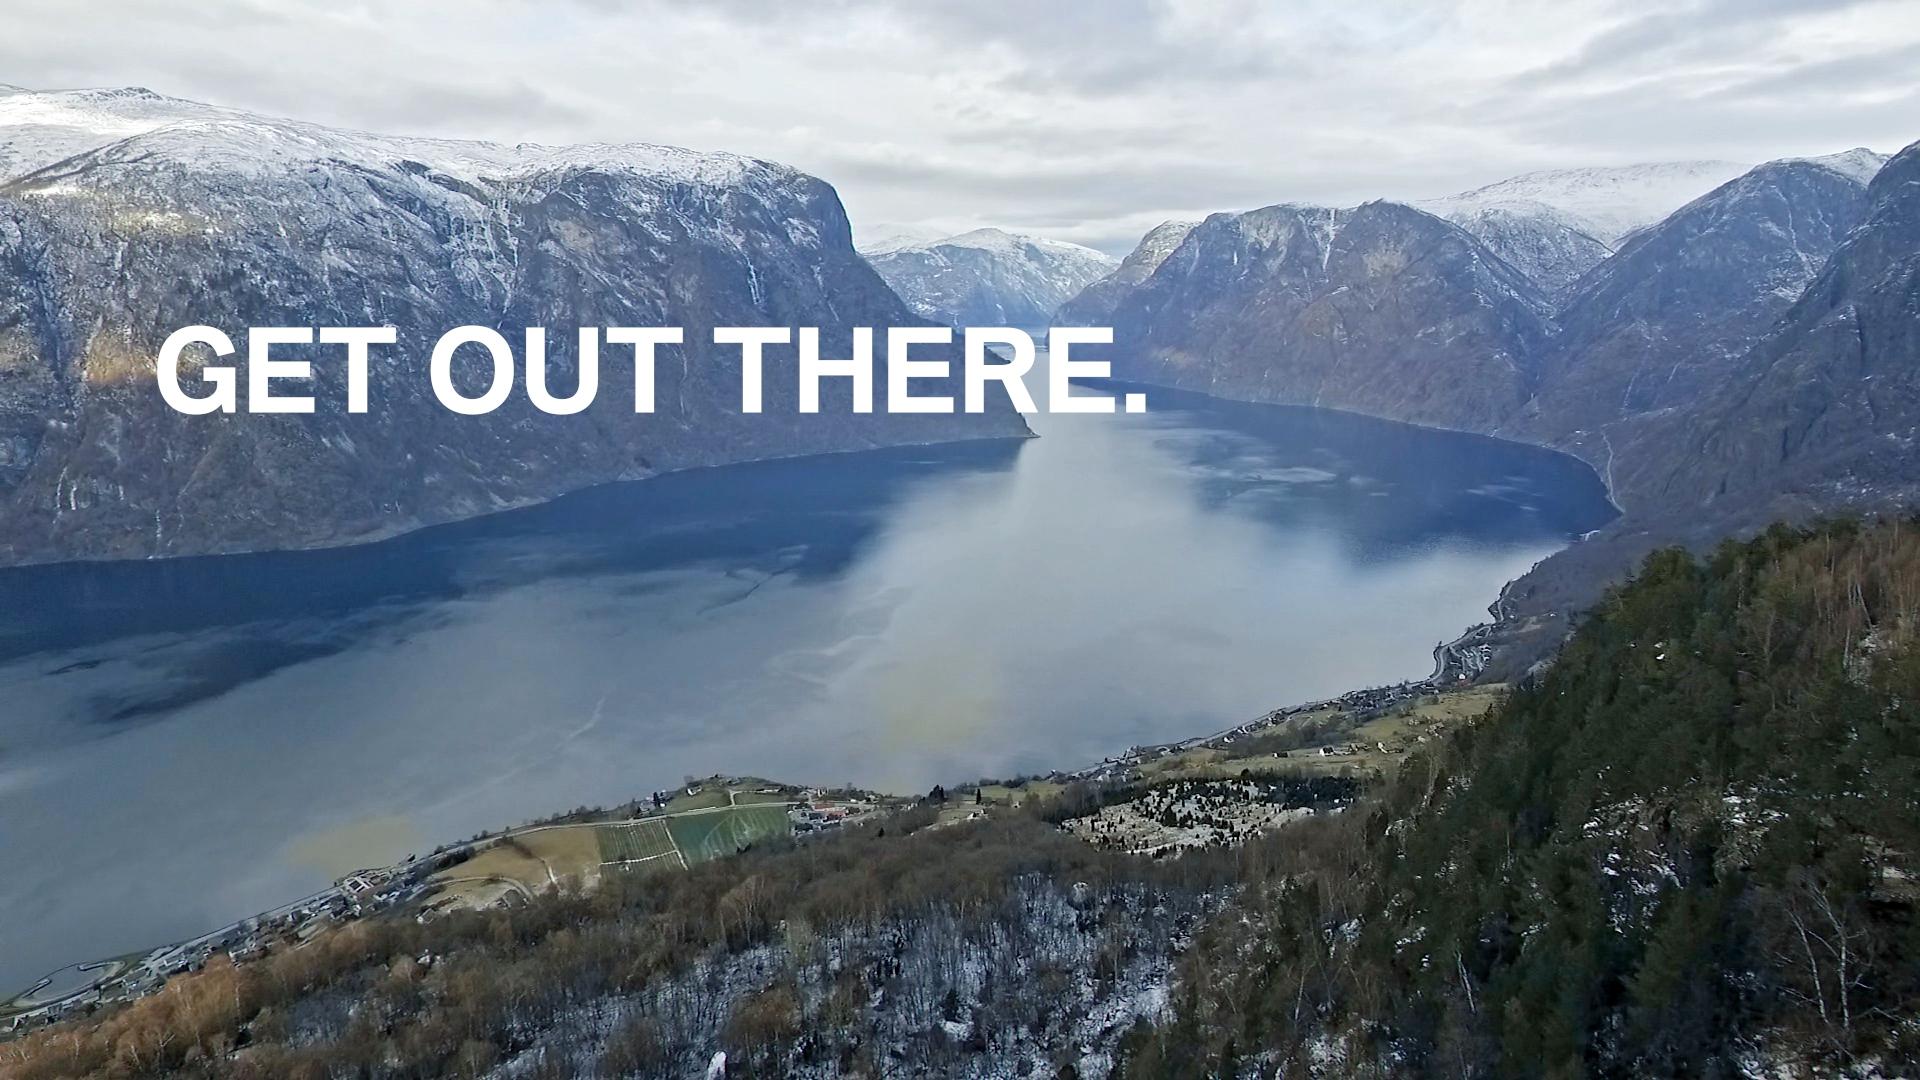 Get Out there Norwegen Schweden BMW Kampagne Werbung Social Media Content